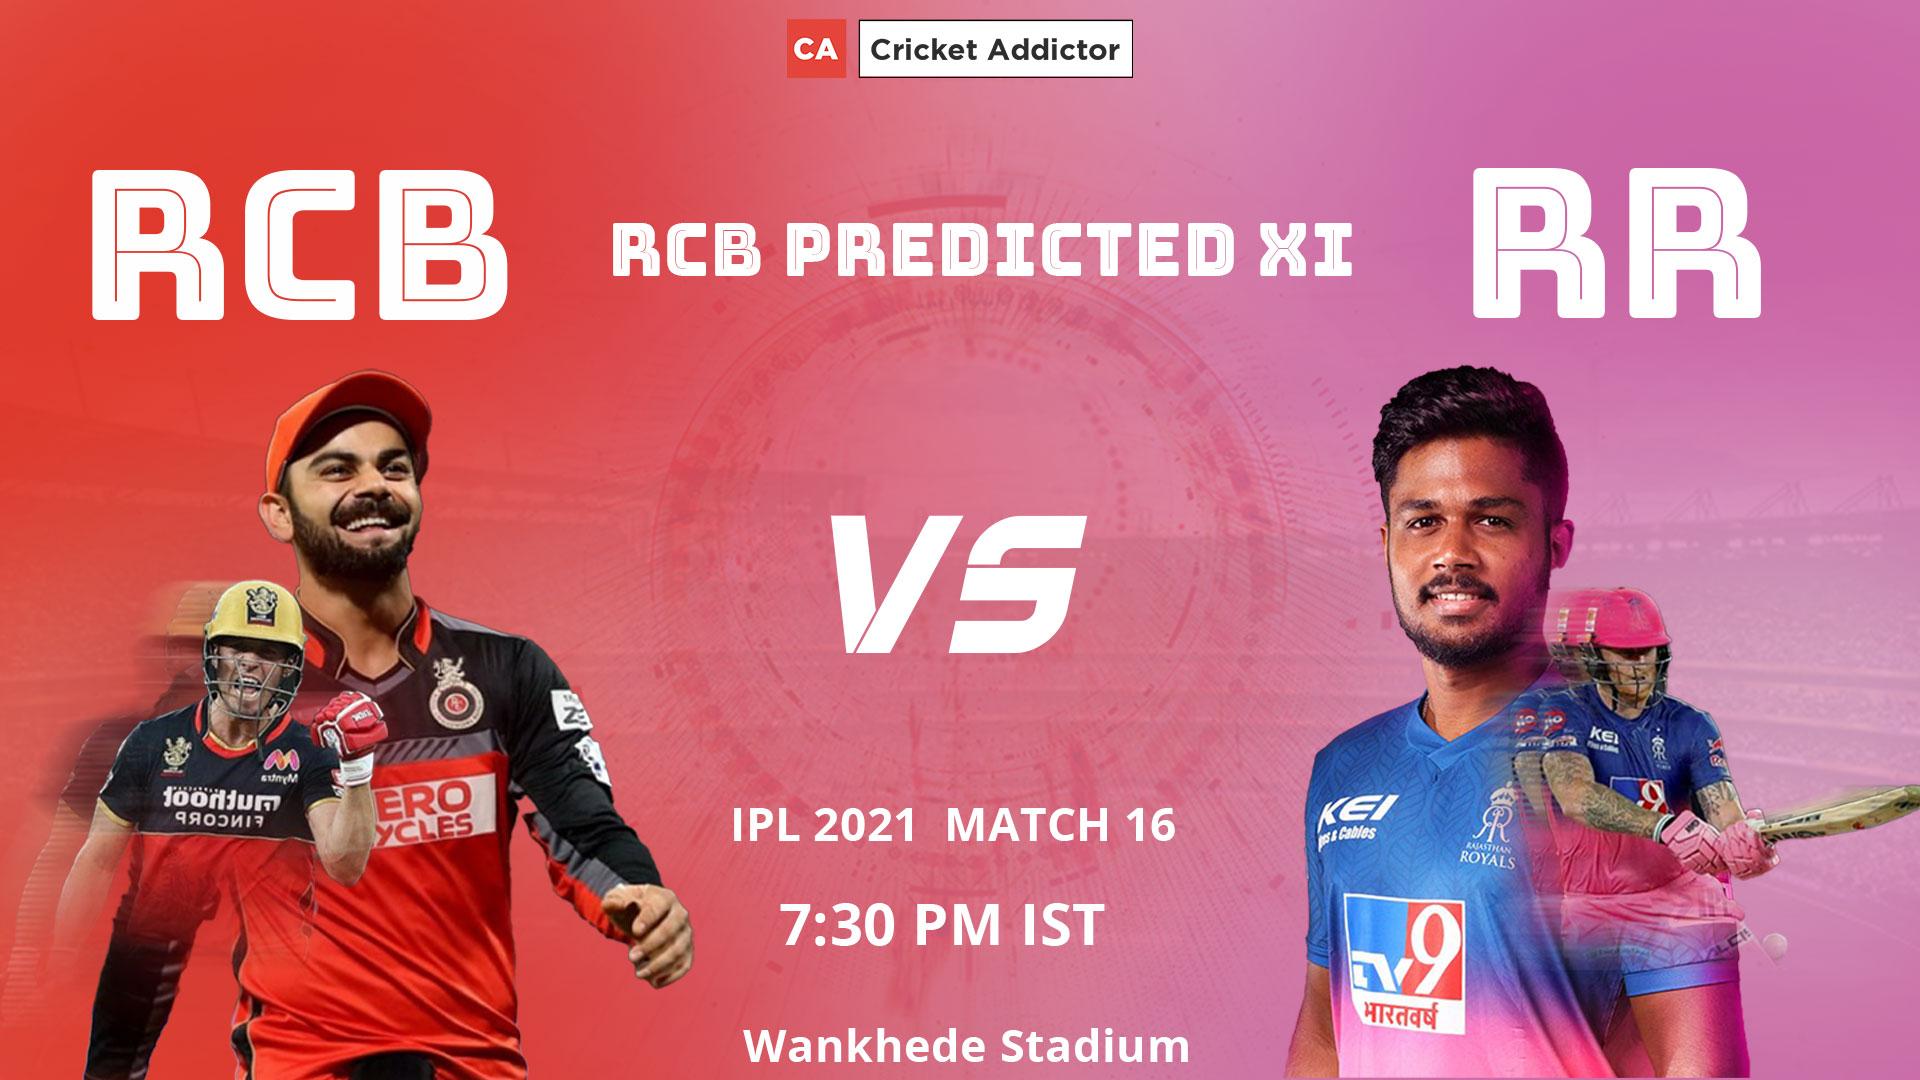 IPL 2021, Royal Challengers Bangalore, RCB, RCB vs RR, predicted playing XI, playing XI